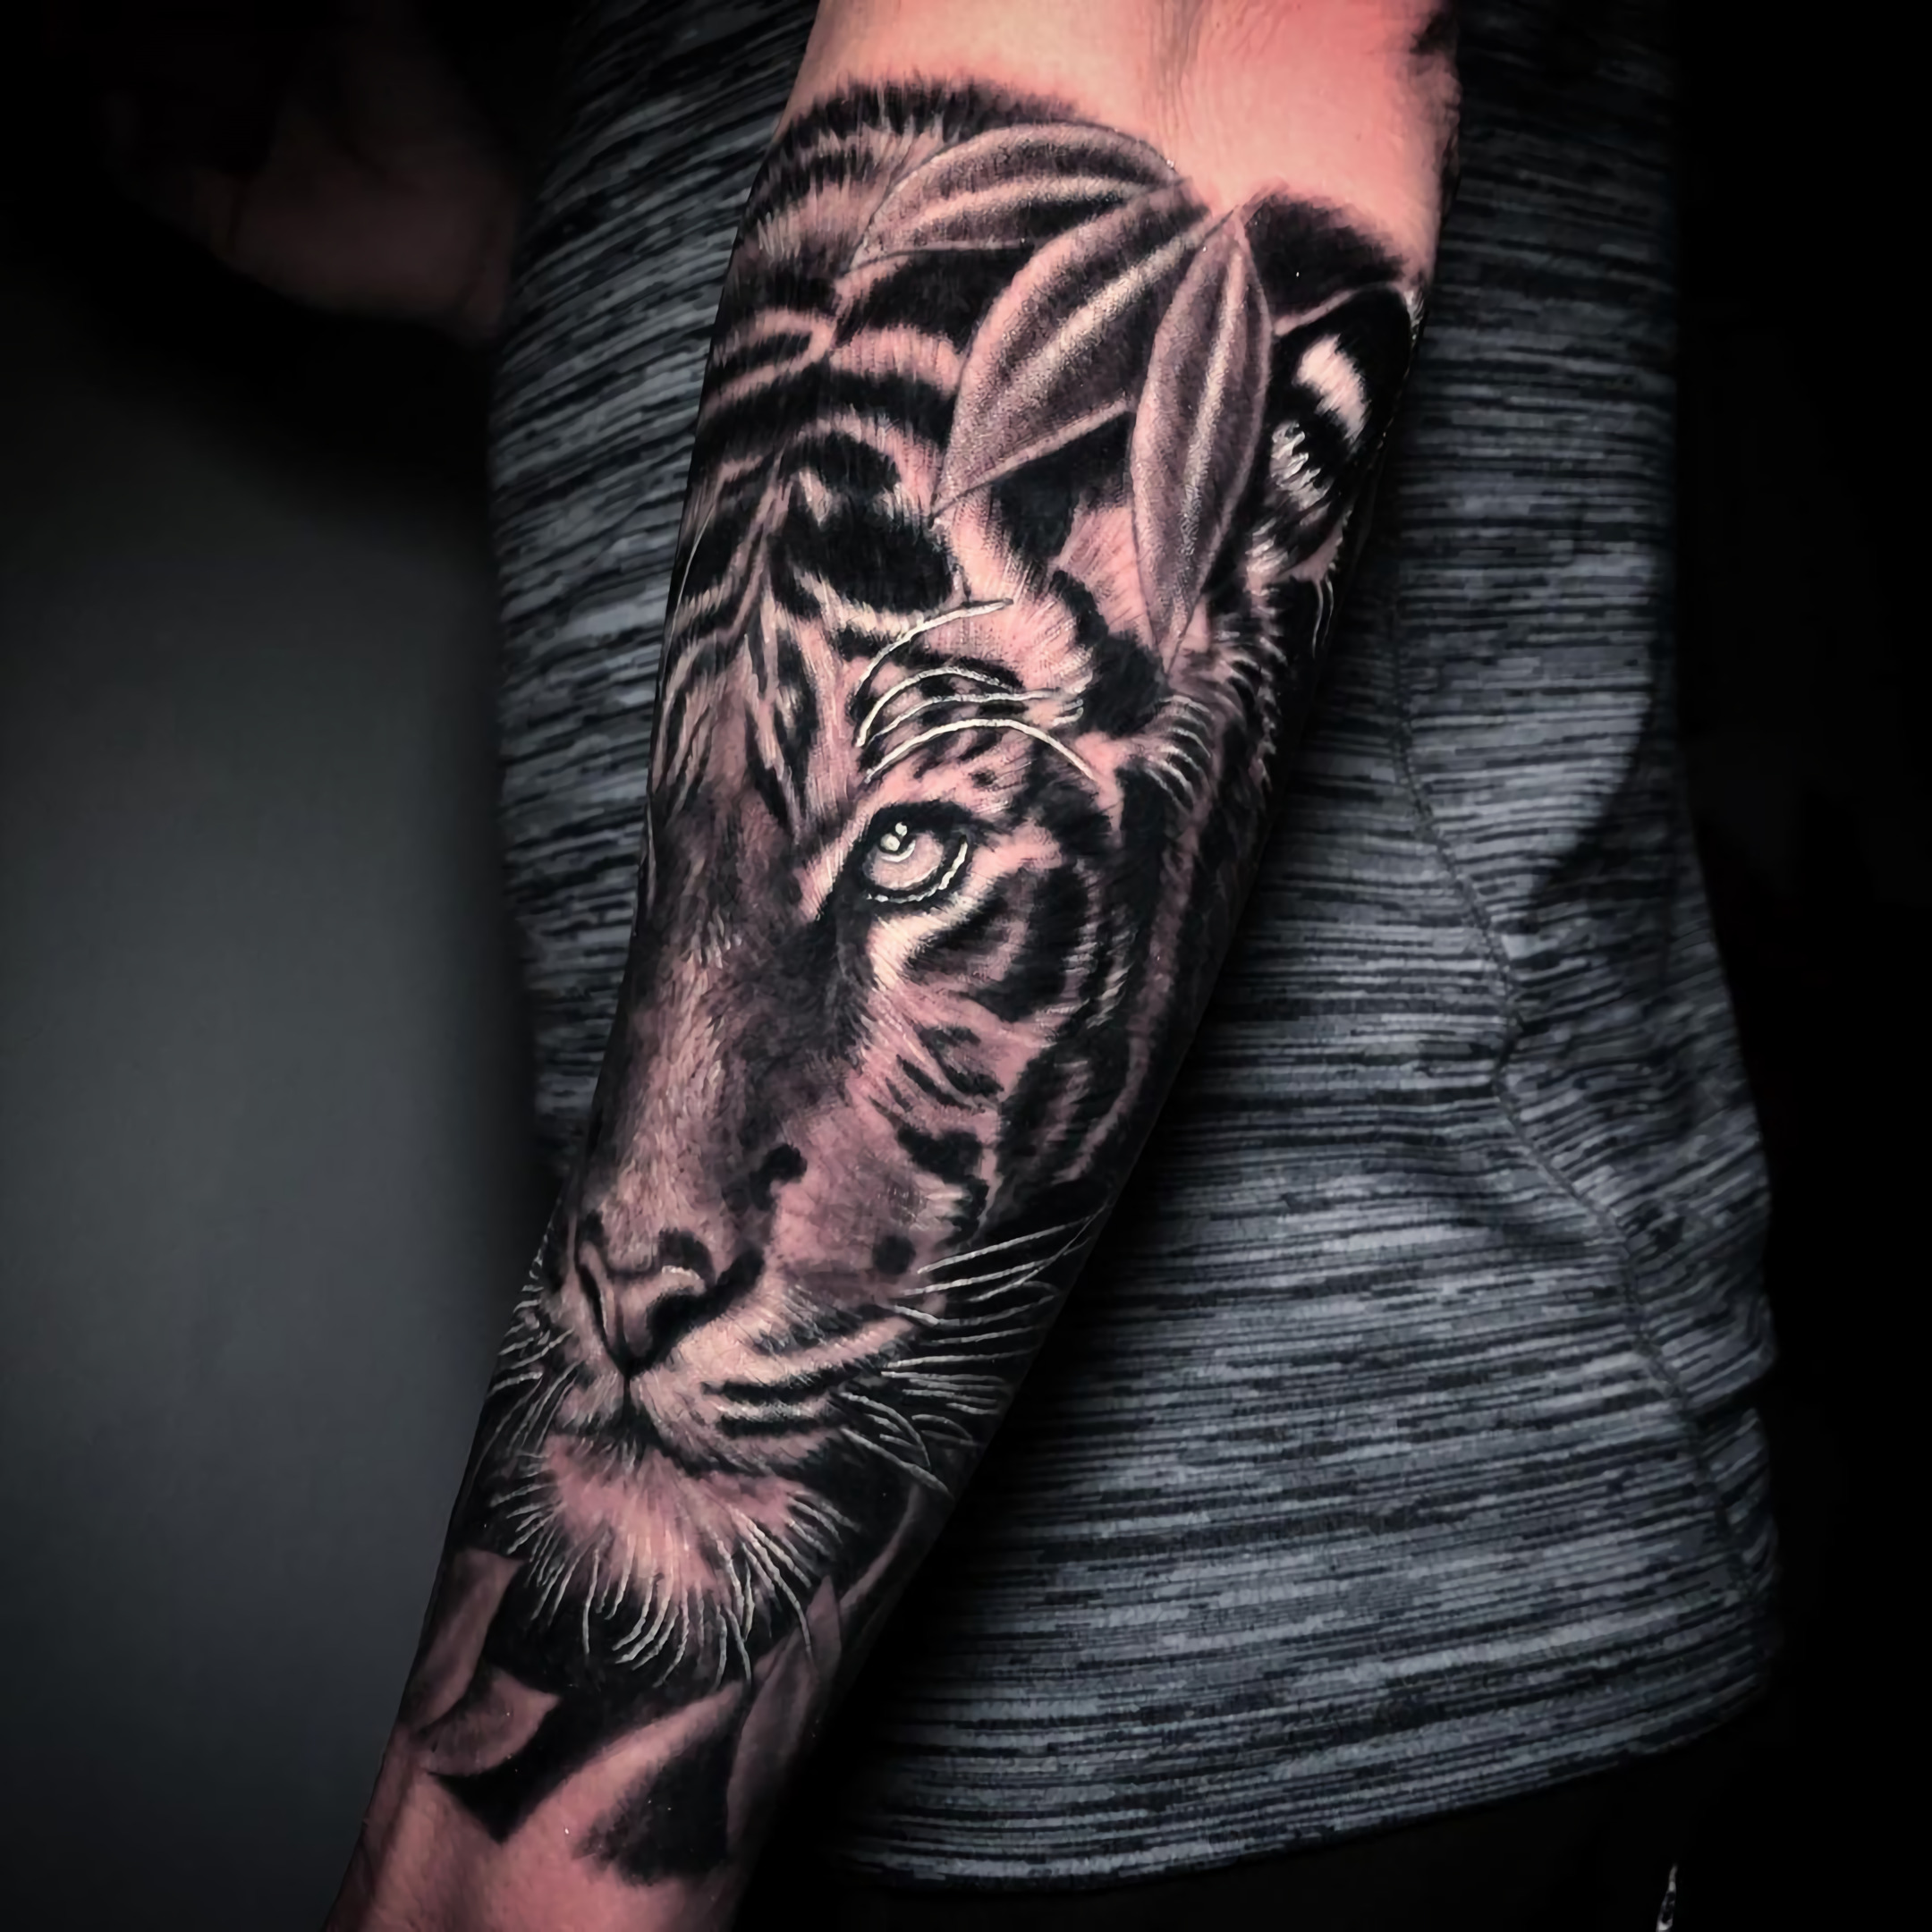 Татуировка на пол рукава с тигром